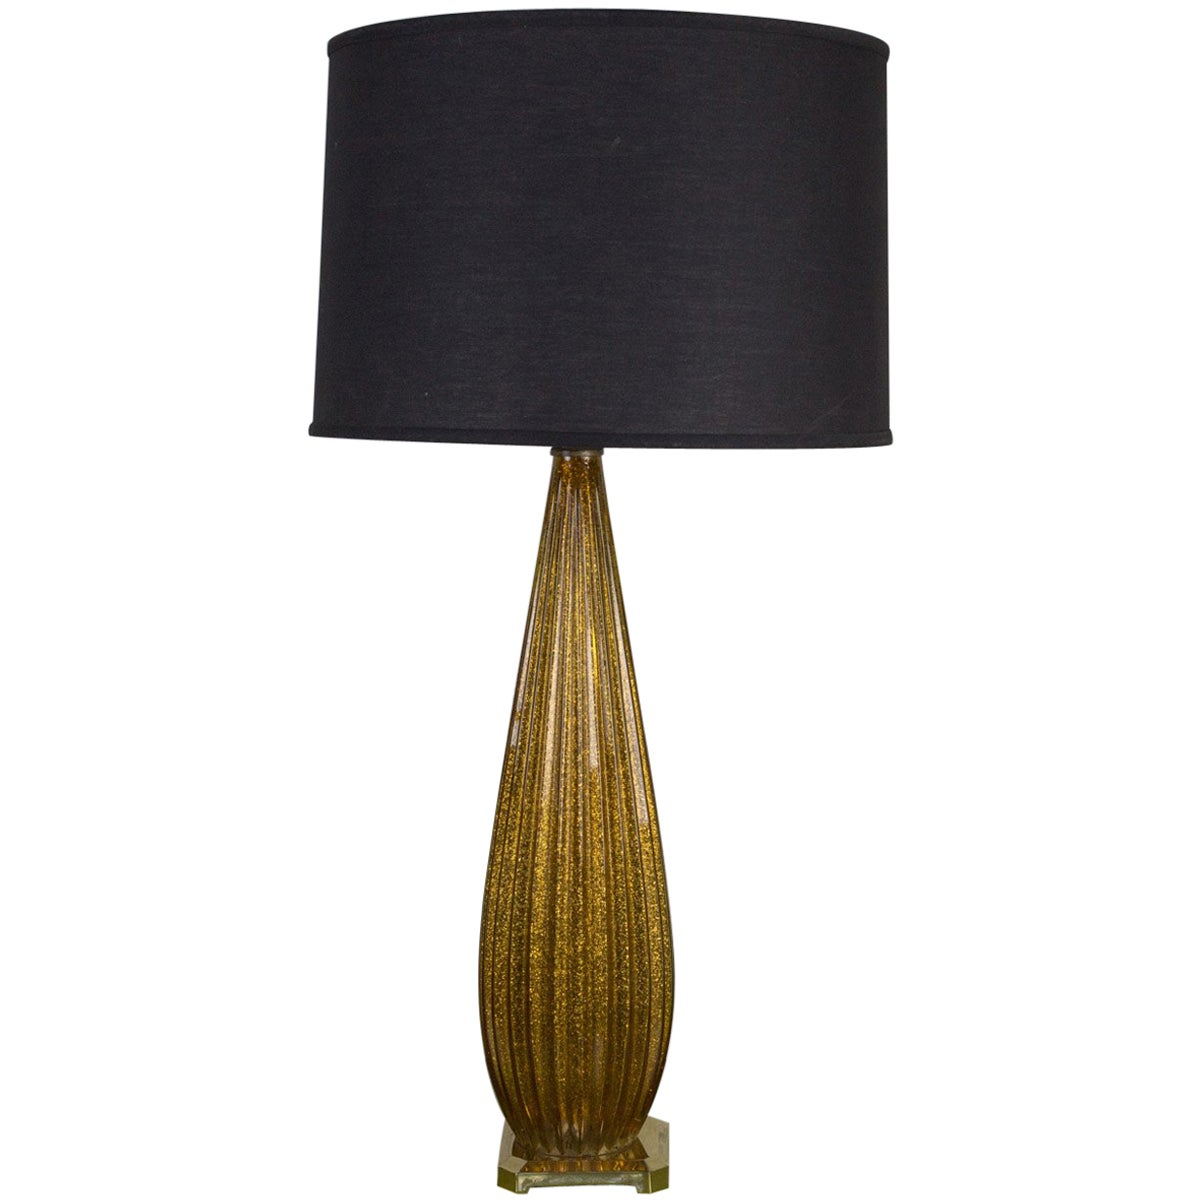 Tall Gold Murano Glass Lamp